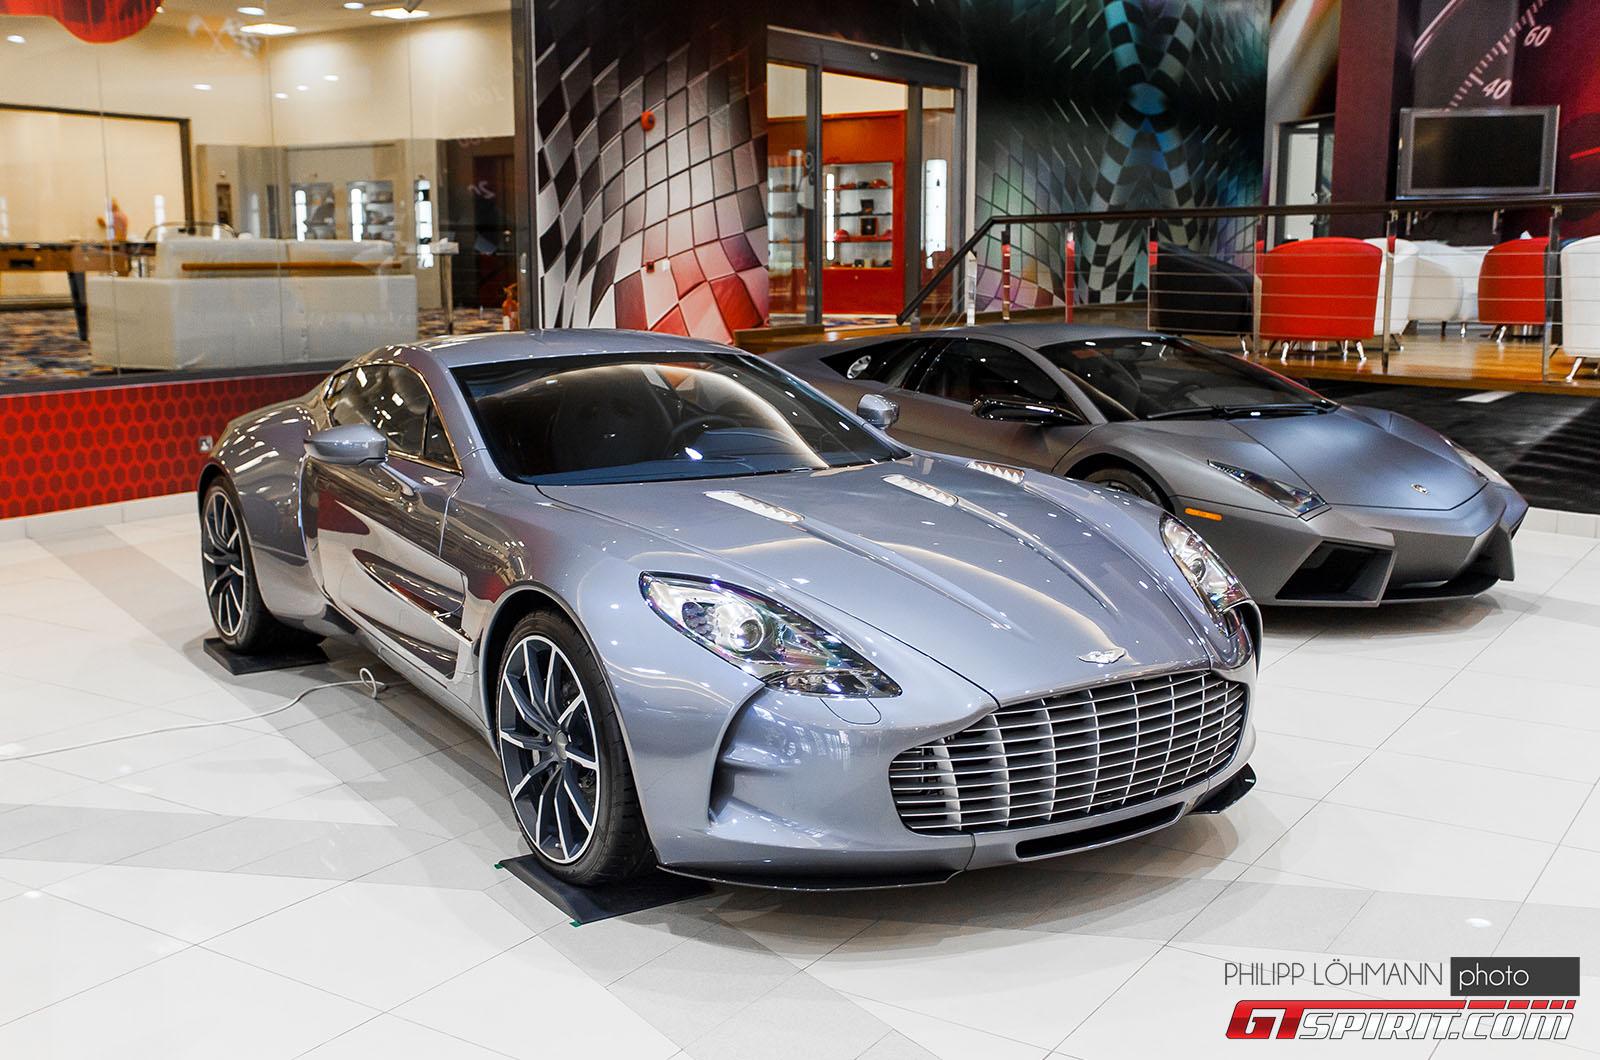 Гараж мечты в Абу-Даби. Aston Martin One-77